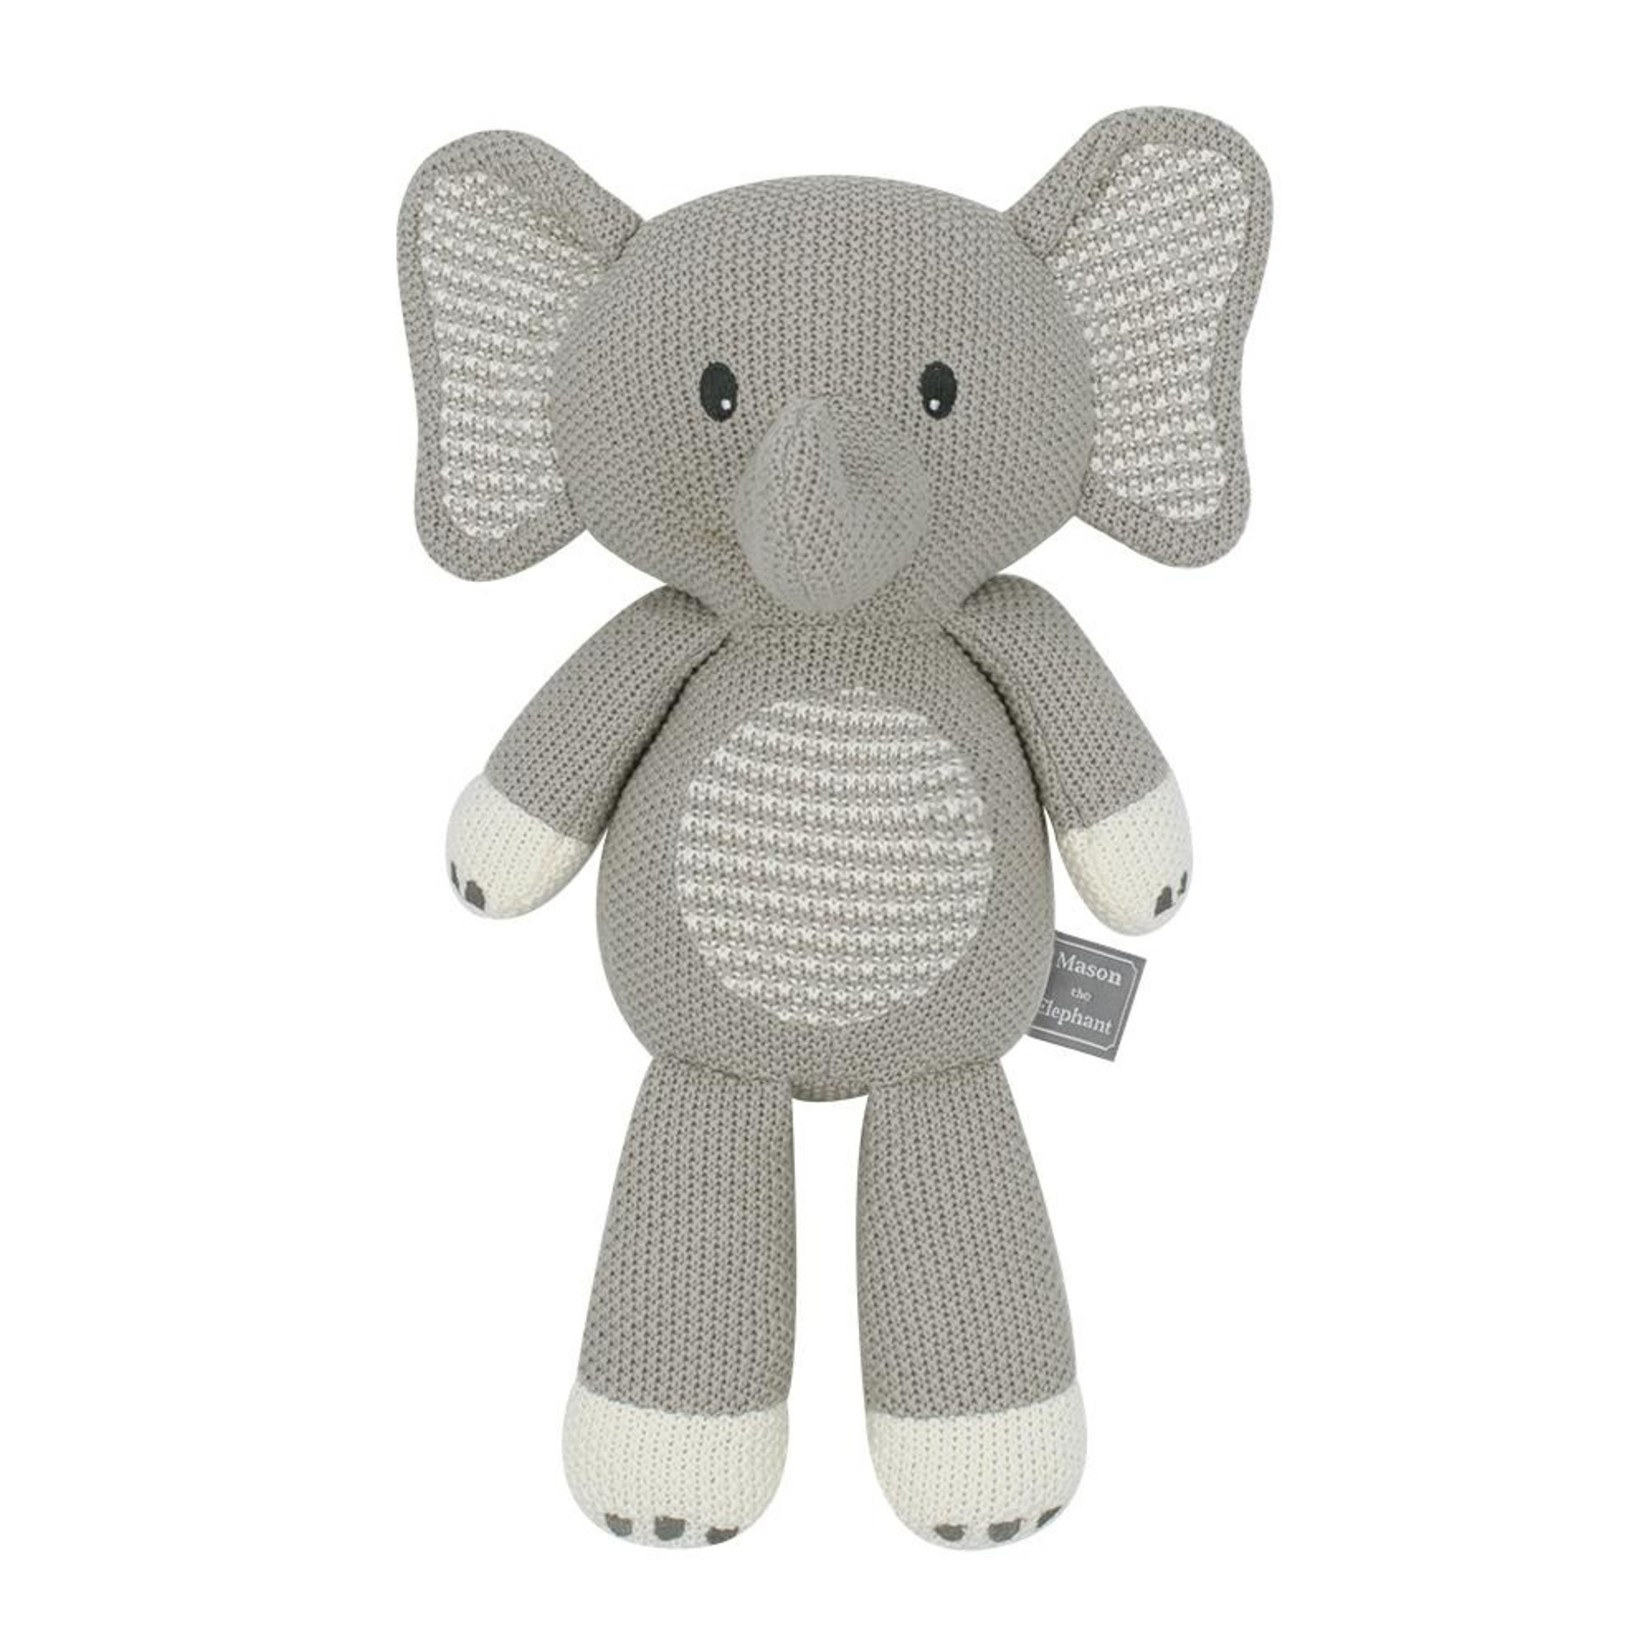 Living Textiles Living Textiles Whimsical Toy - Mason the Elephant